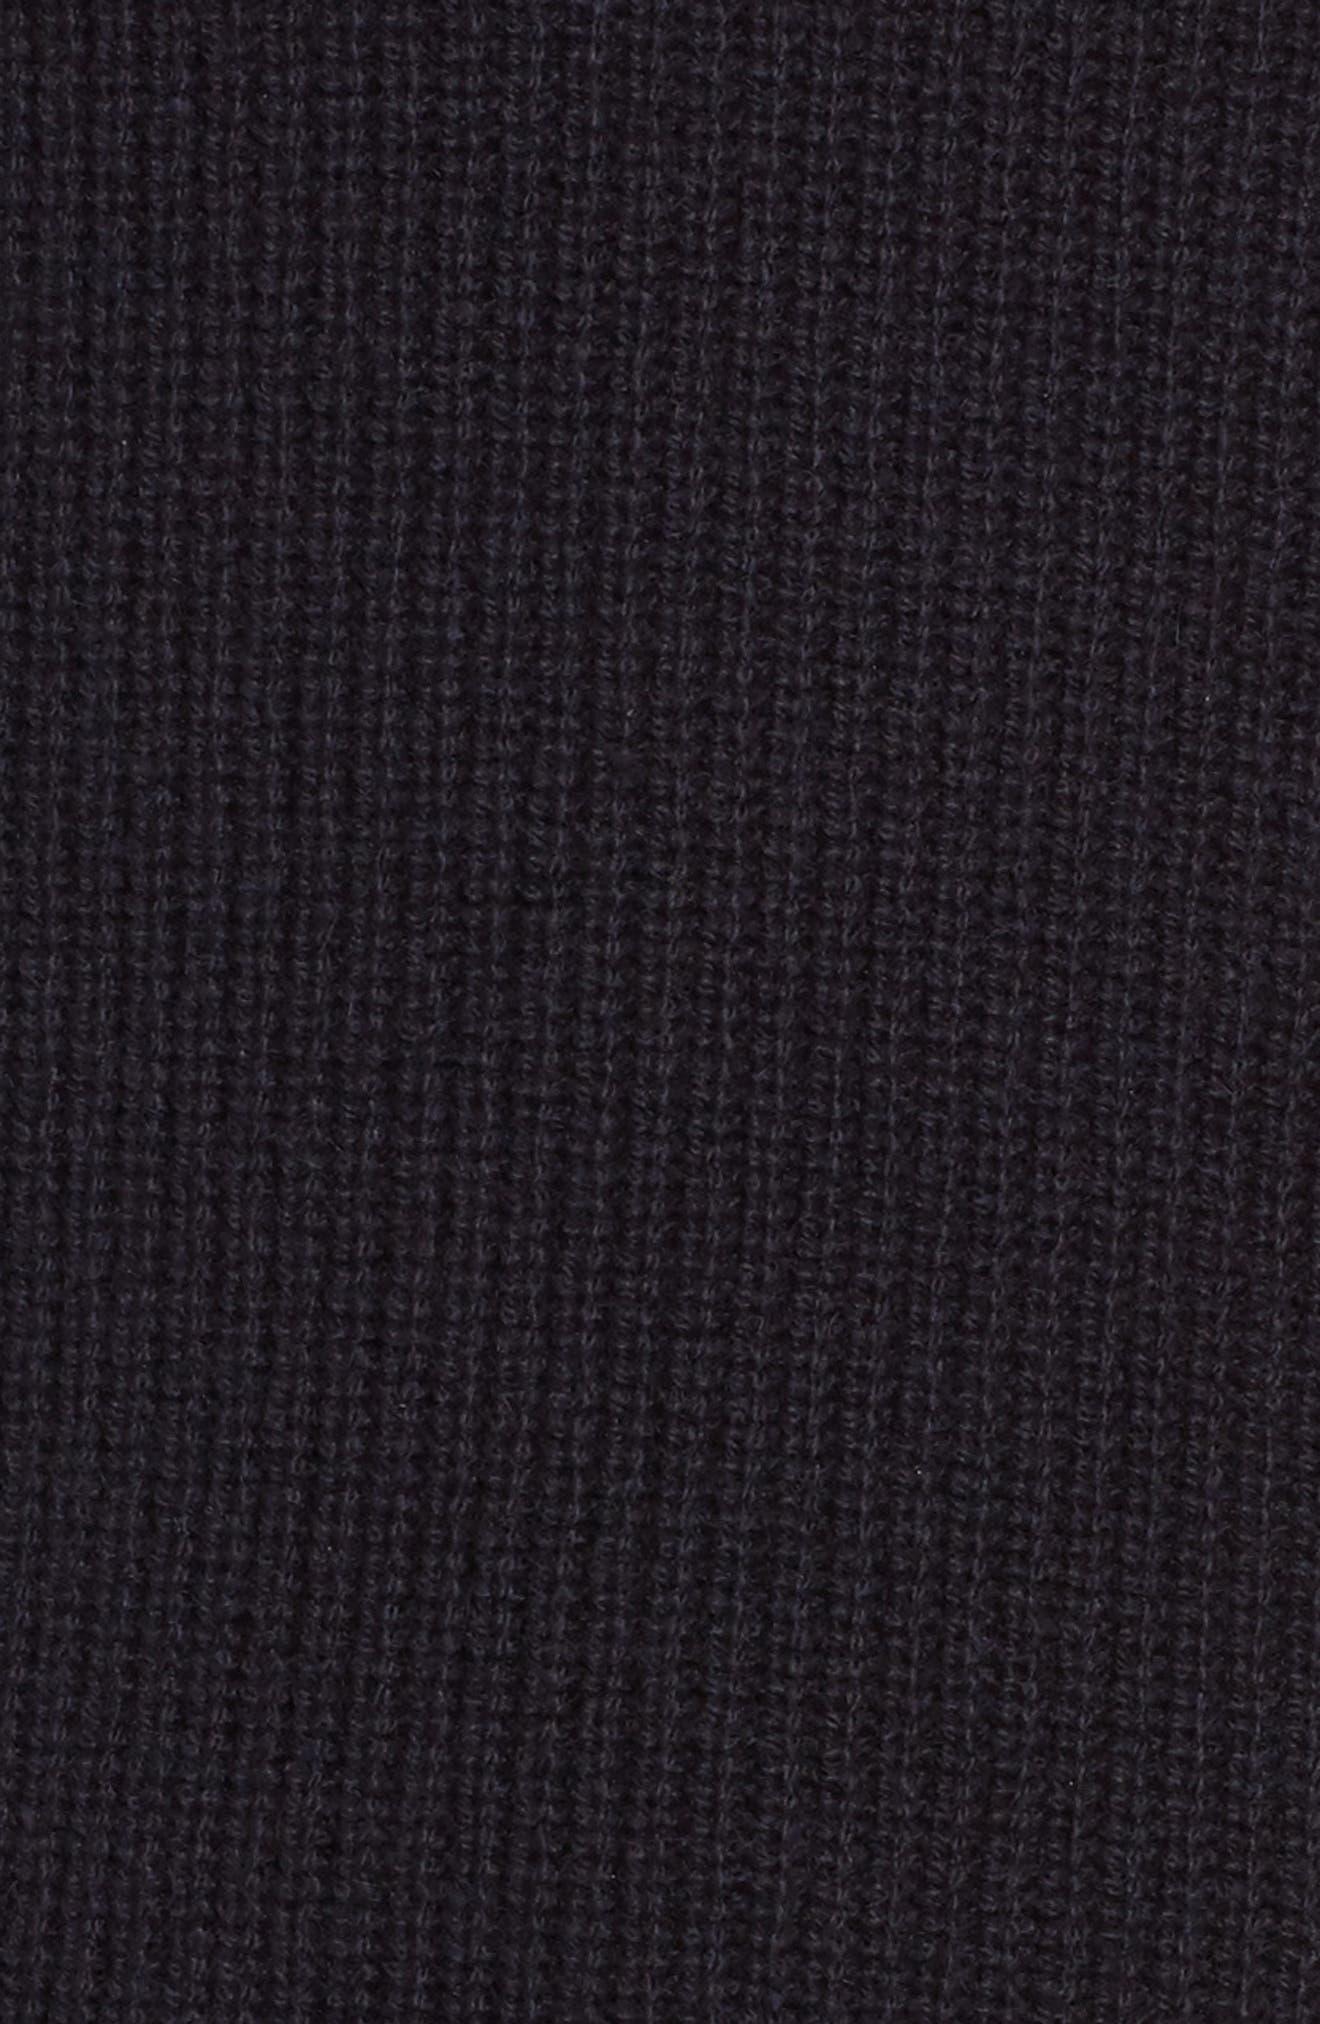 Filda Tie Side Wool Blend Sweater,                             Alternate thumbnail 5, color,                             480